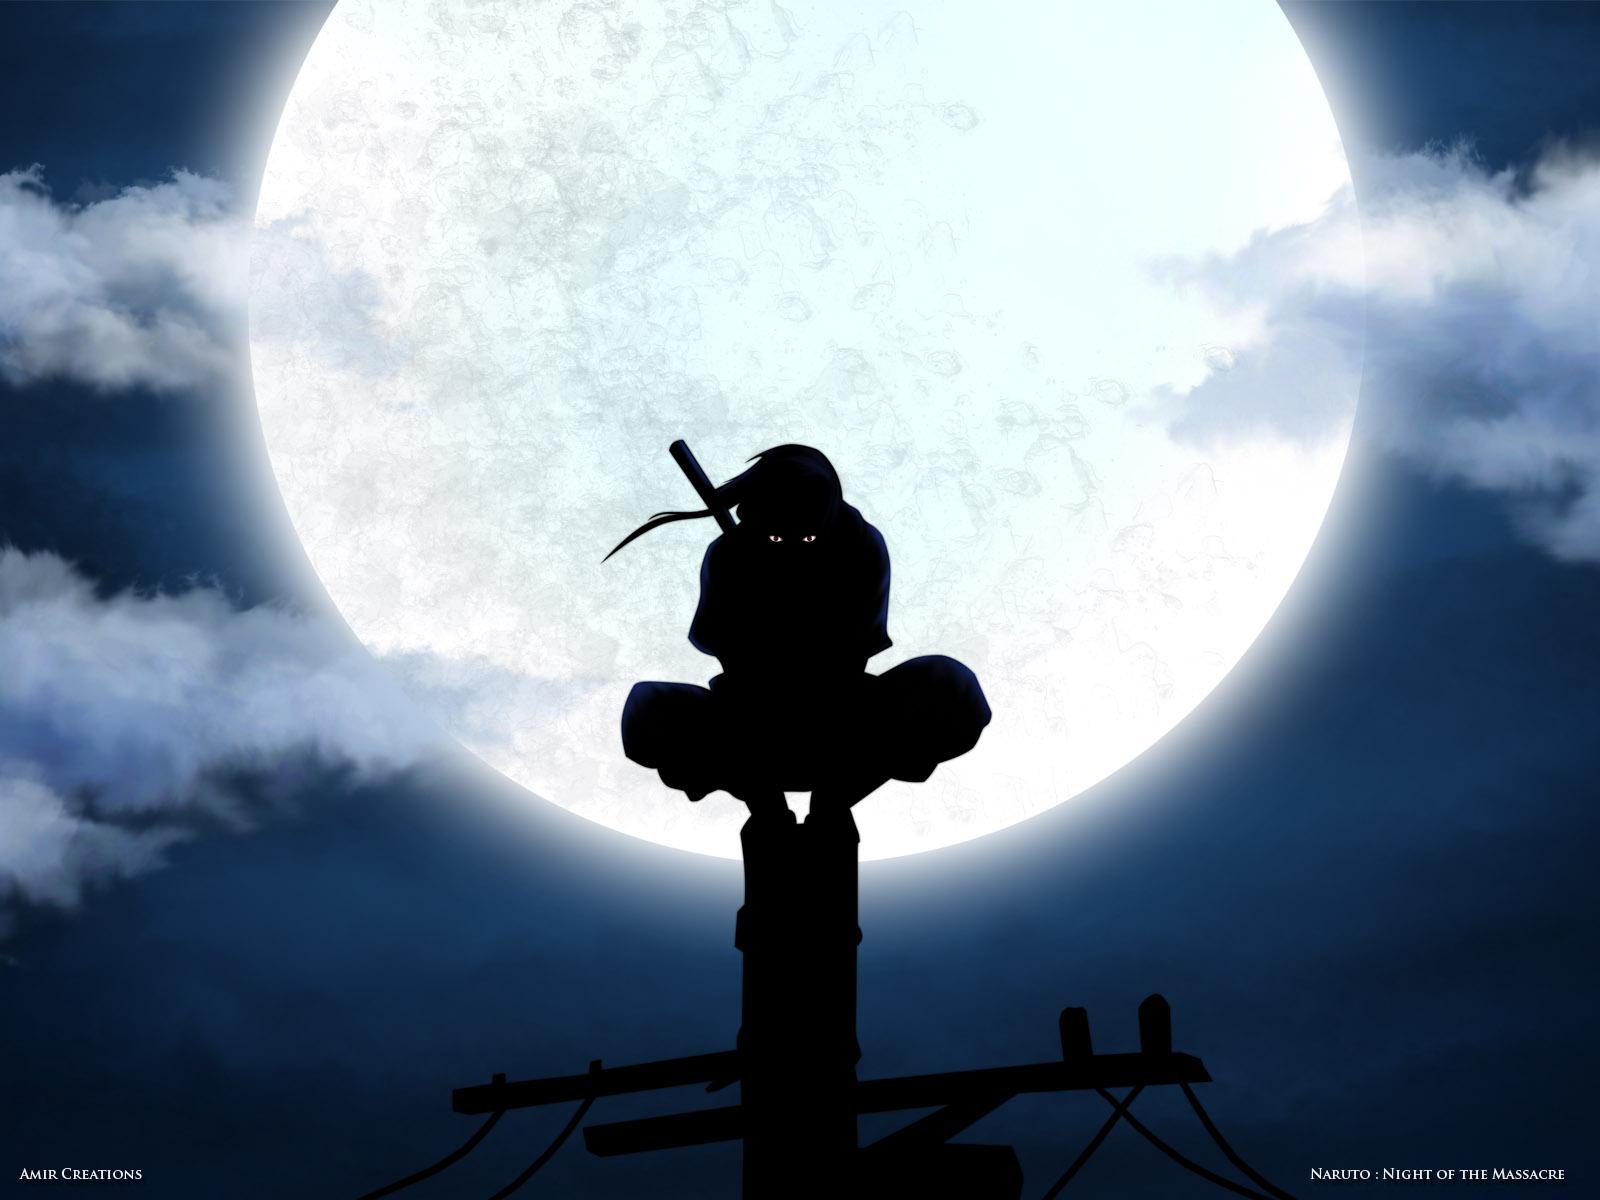 Naruto Shippuden Wallpaper Itachi 10388 Hd Wallpapers in Anime 1600x1200